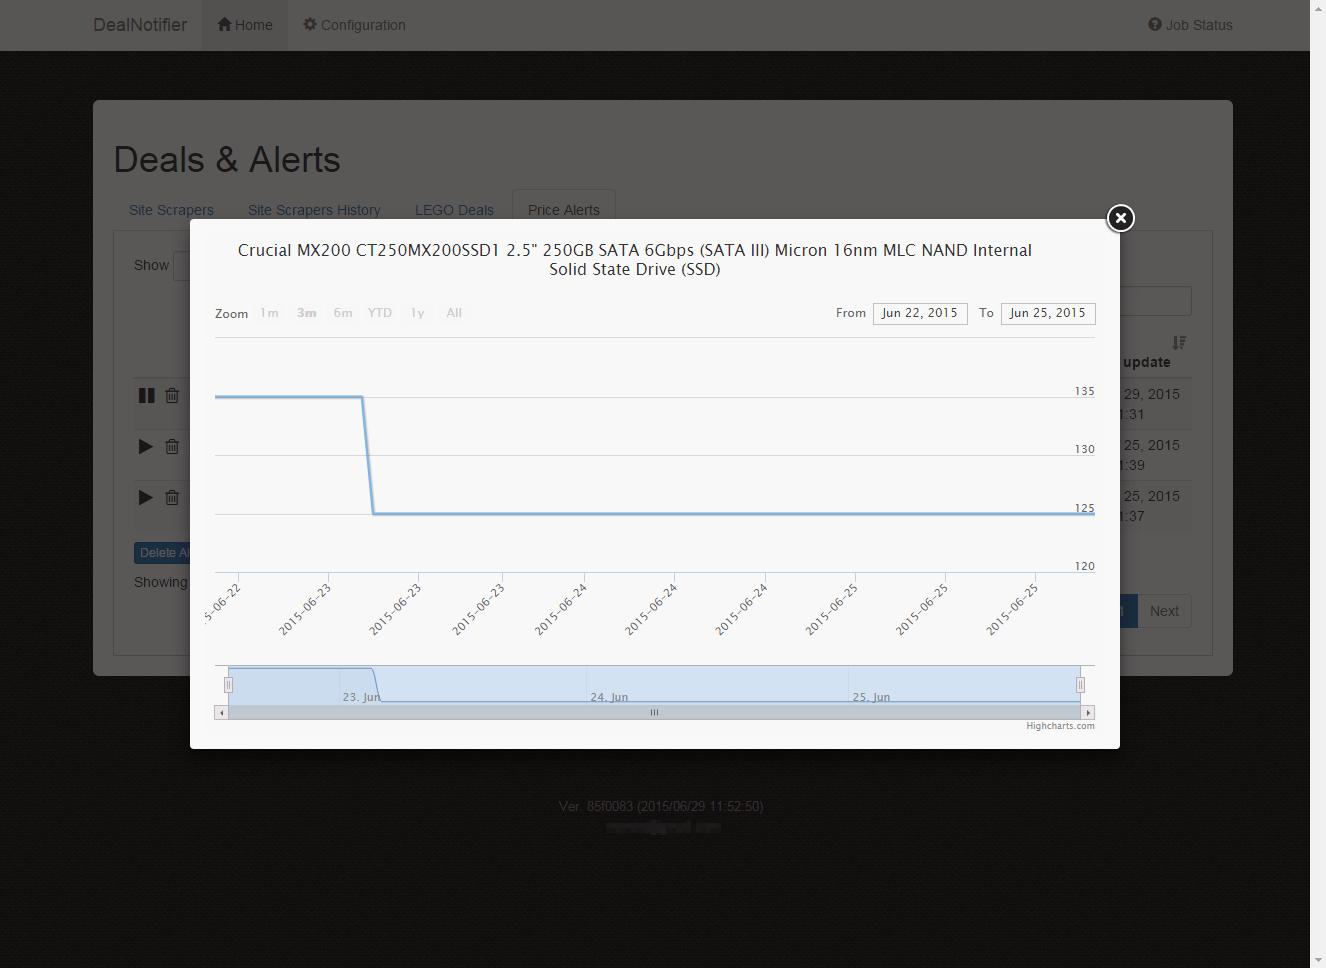 DealNotifier: Price Alerts (Price History Graph)